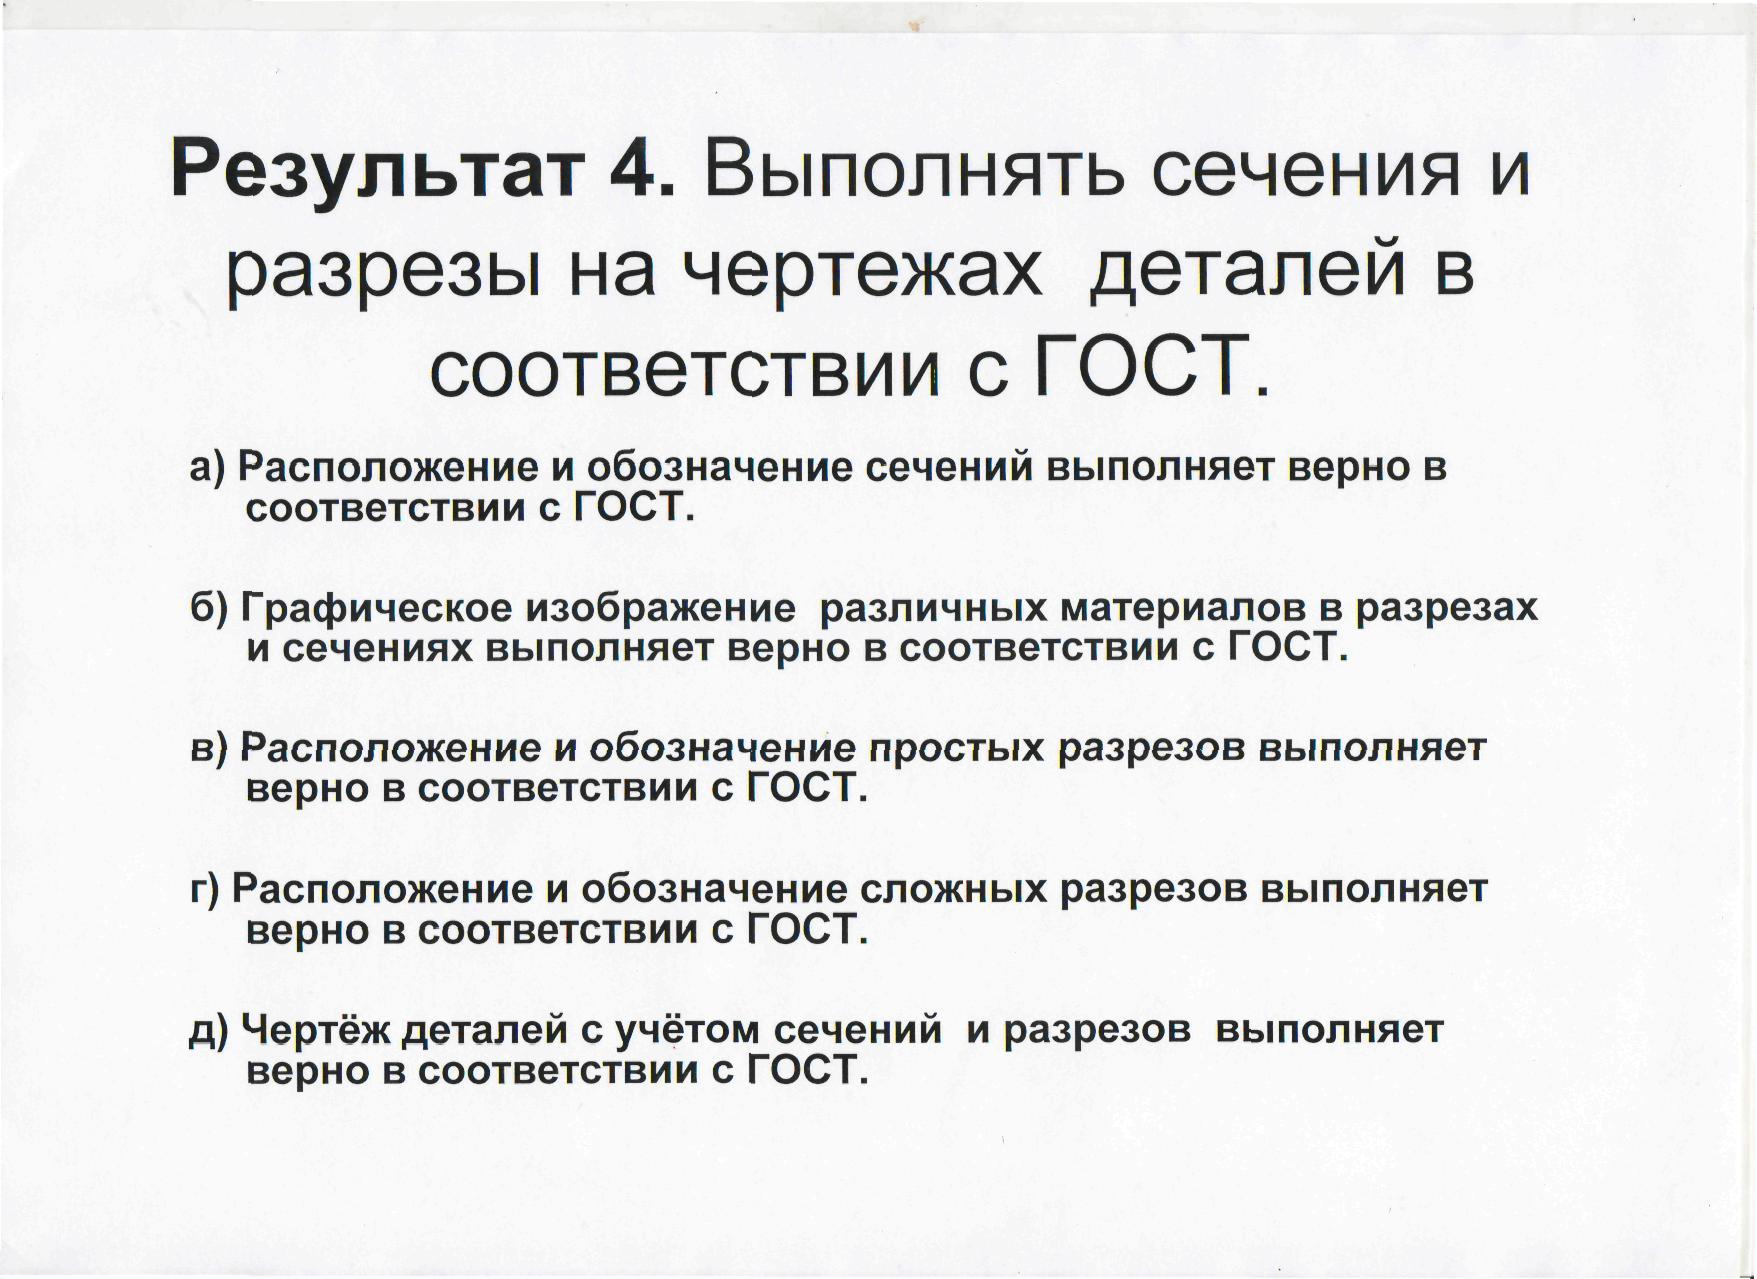 C:\Documents and Settings\1\Мои документы\урок на конкурс 31 октября 2013\3.jpg